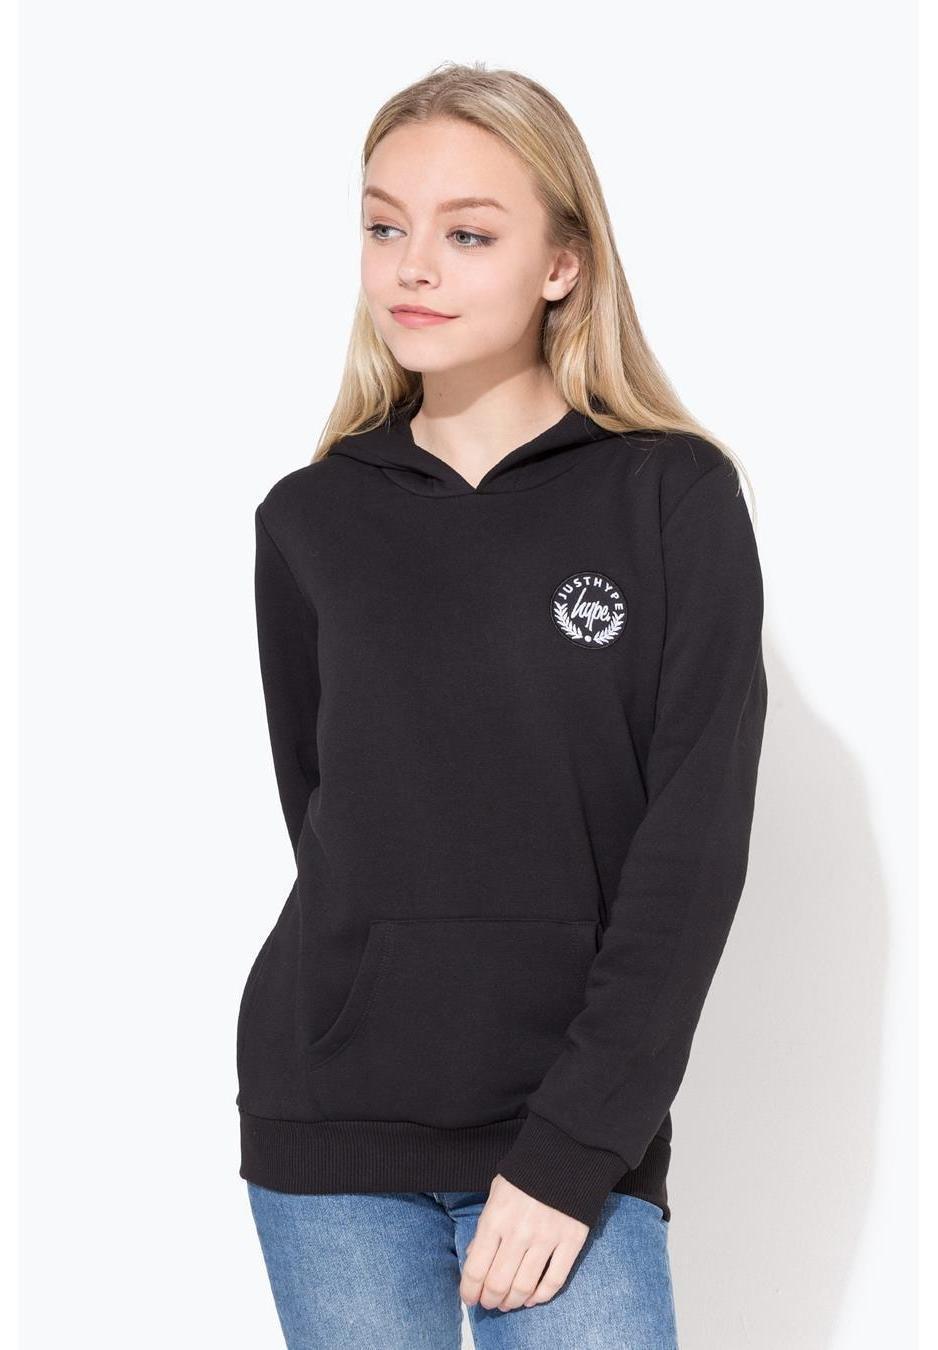 Große Förderung Hype Kapuzenpullover - black | Damenbekleidung 2020